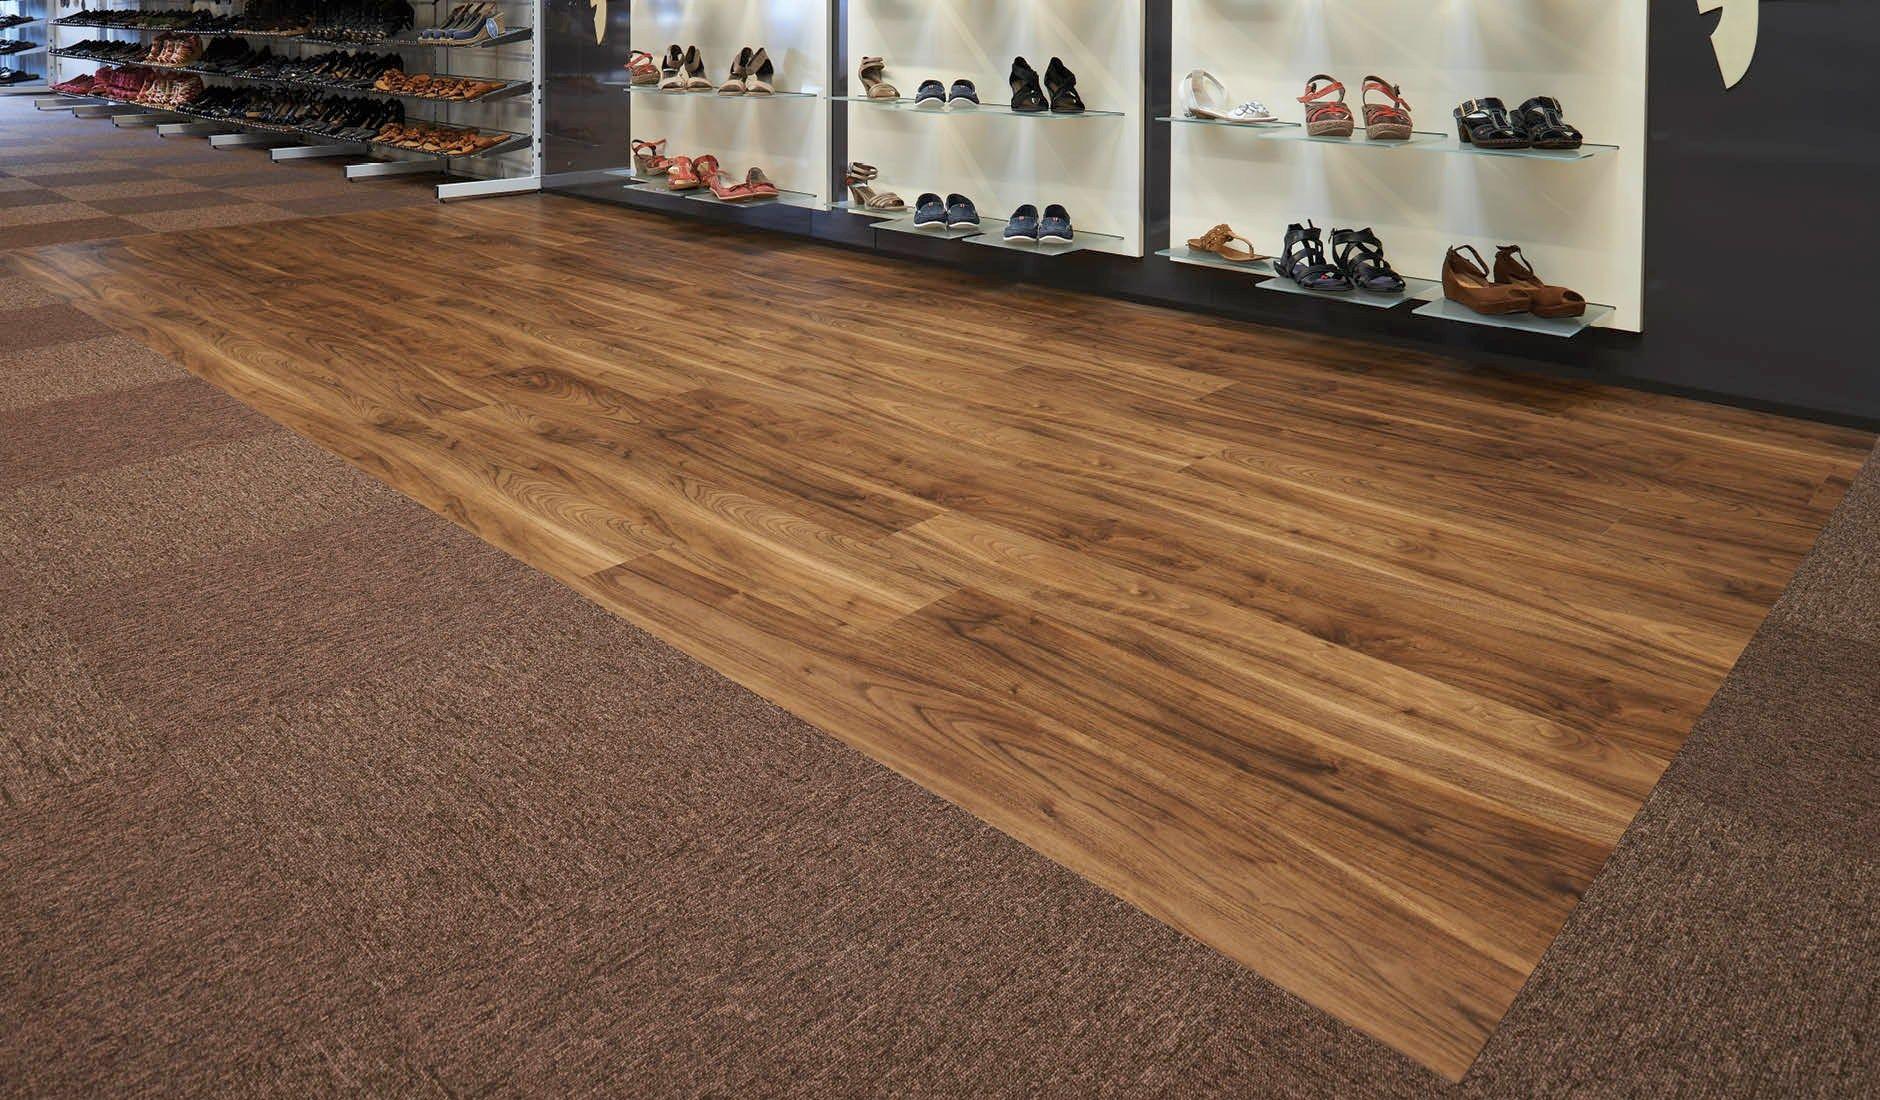 hardwood flooring glasgow hillington of nextstep flooring nextstepf on pinterest regarding f7880d521a27ea94b97963d13d906aef